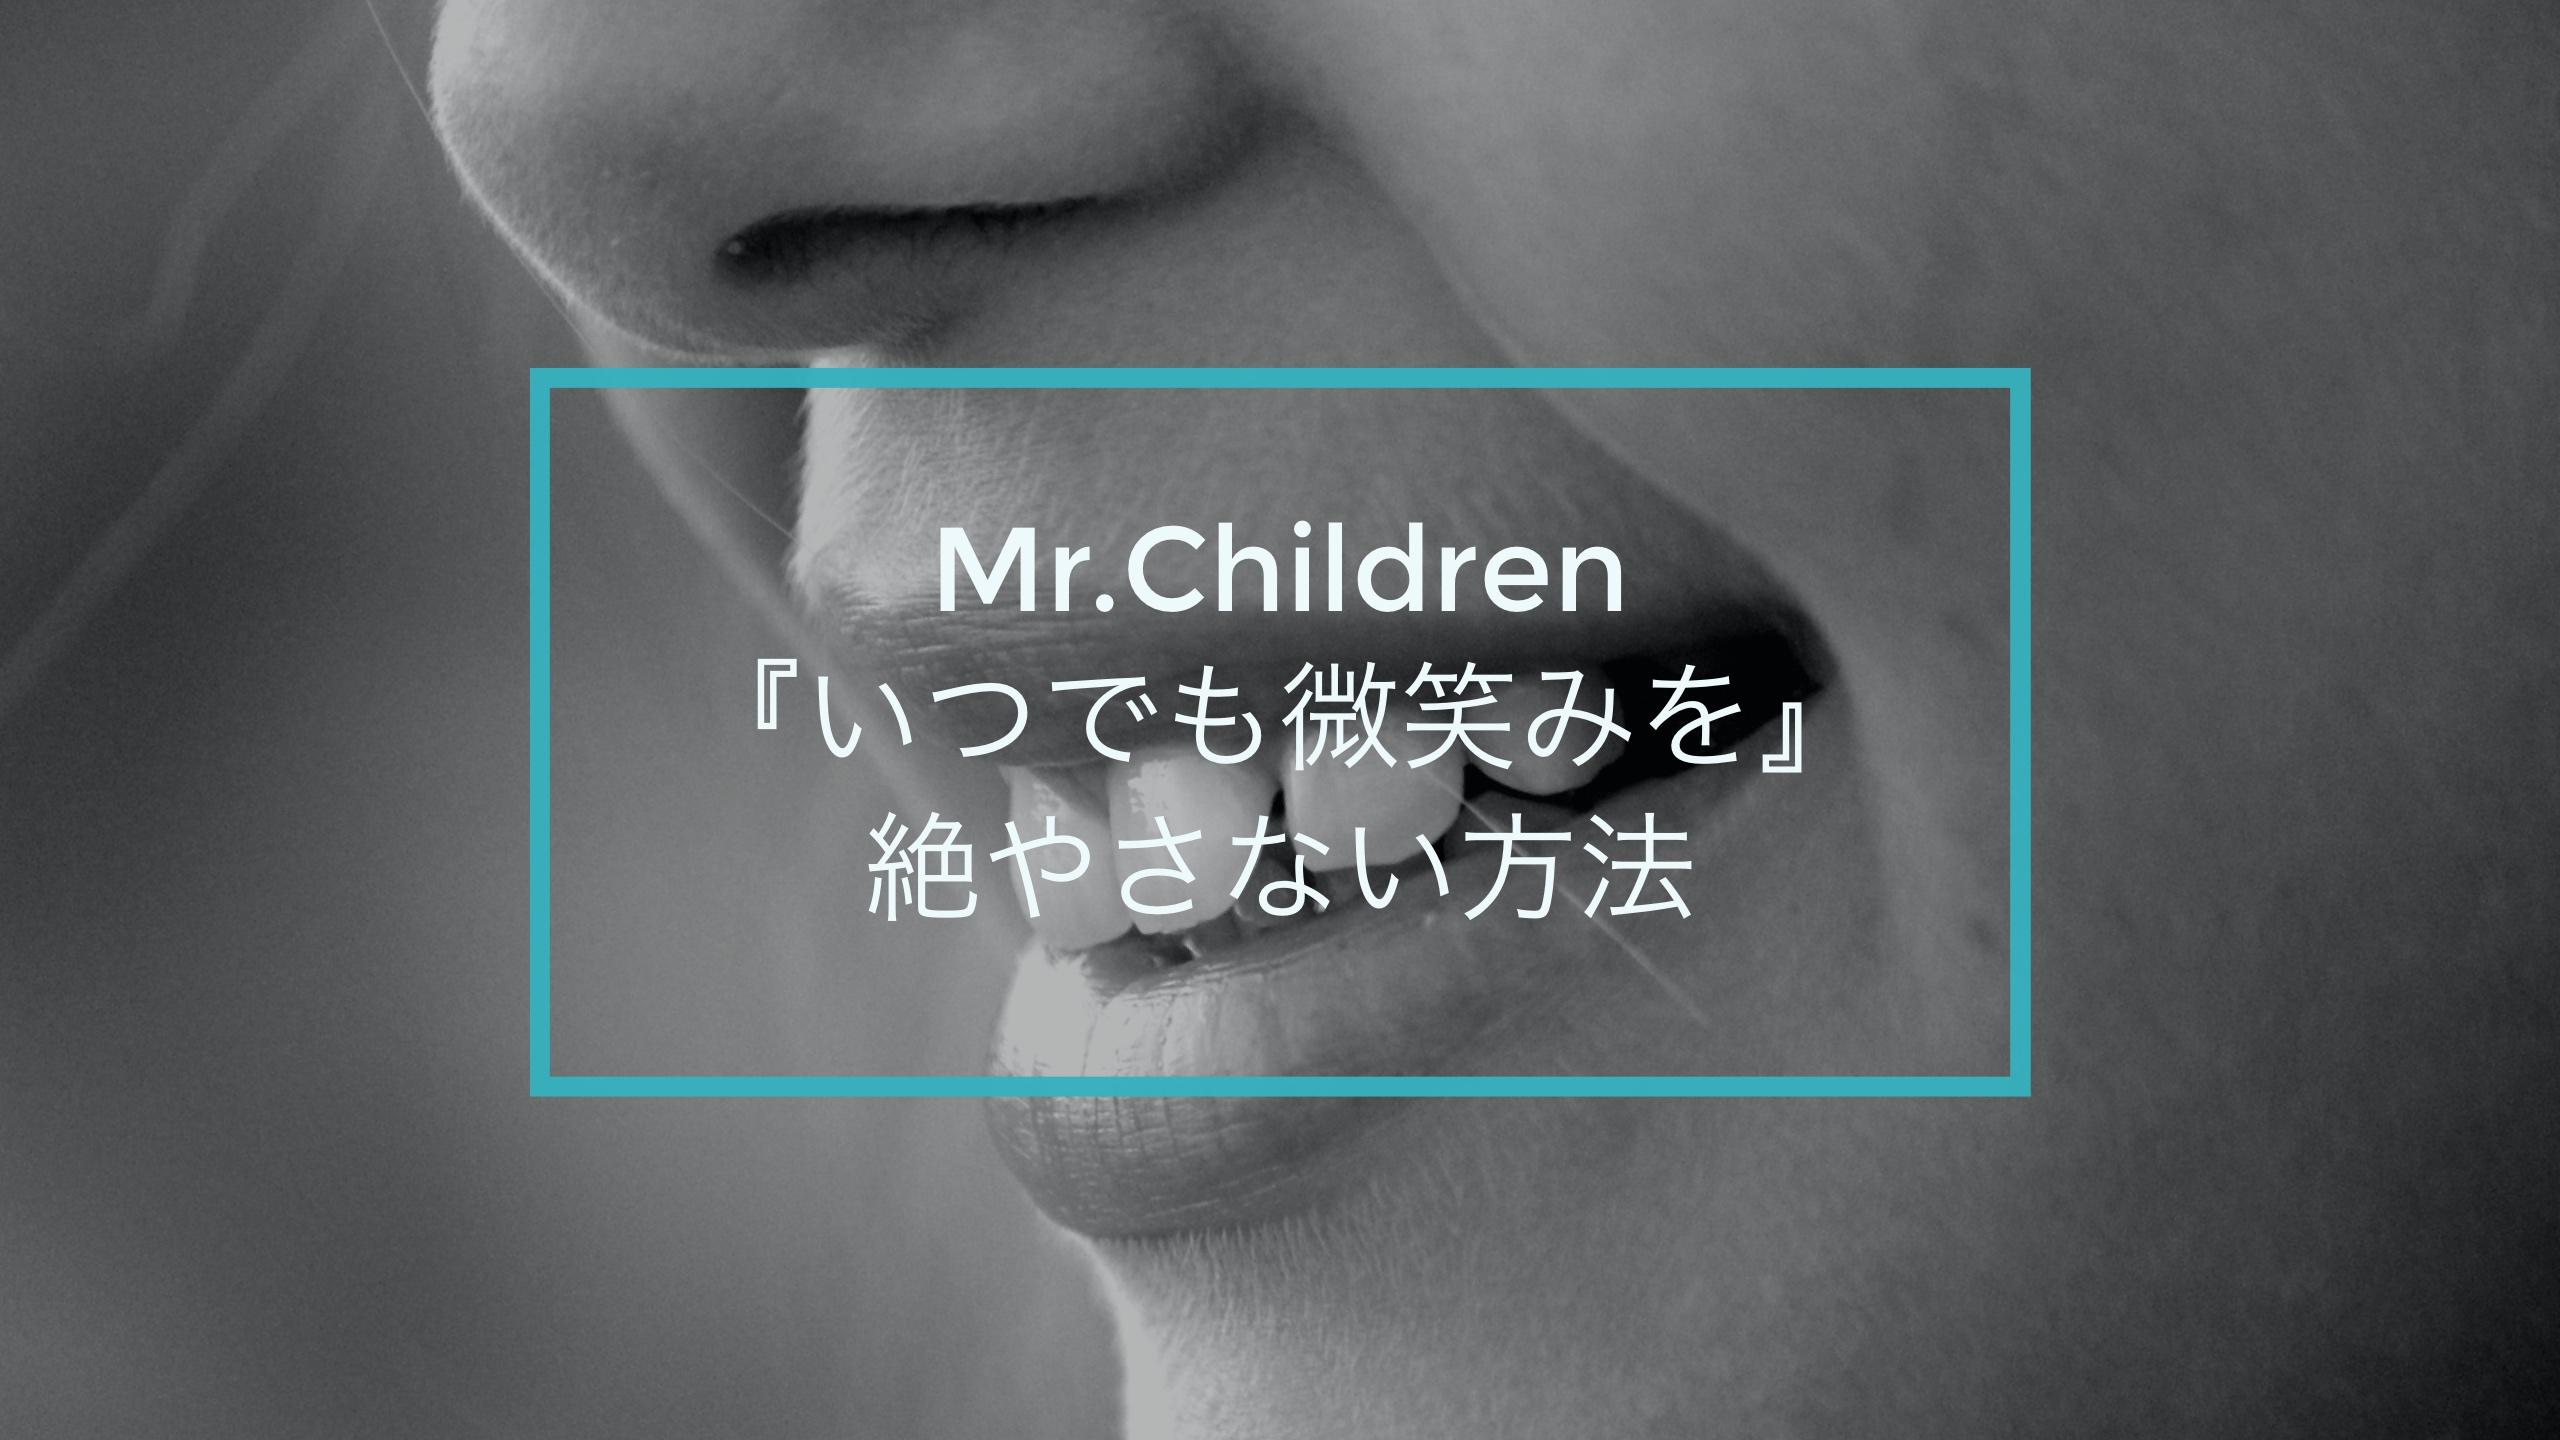 Mr.Children『いつでも微笑みを』から学ぶいつも微笑みを絶やさない方法